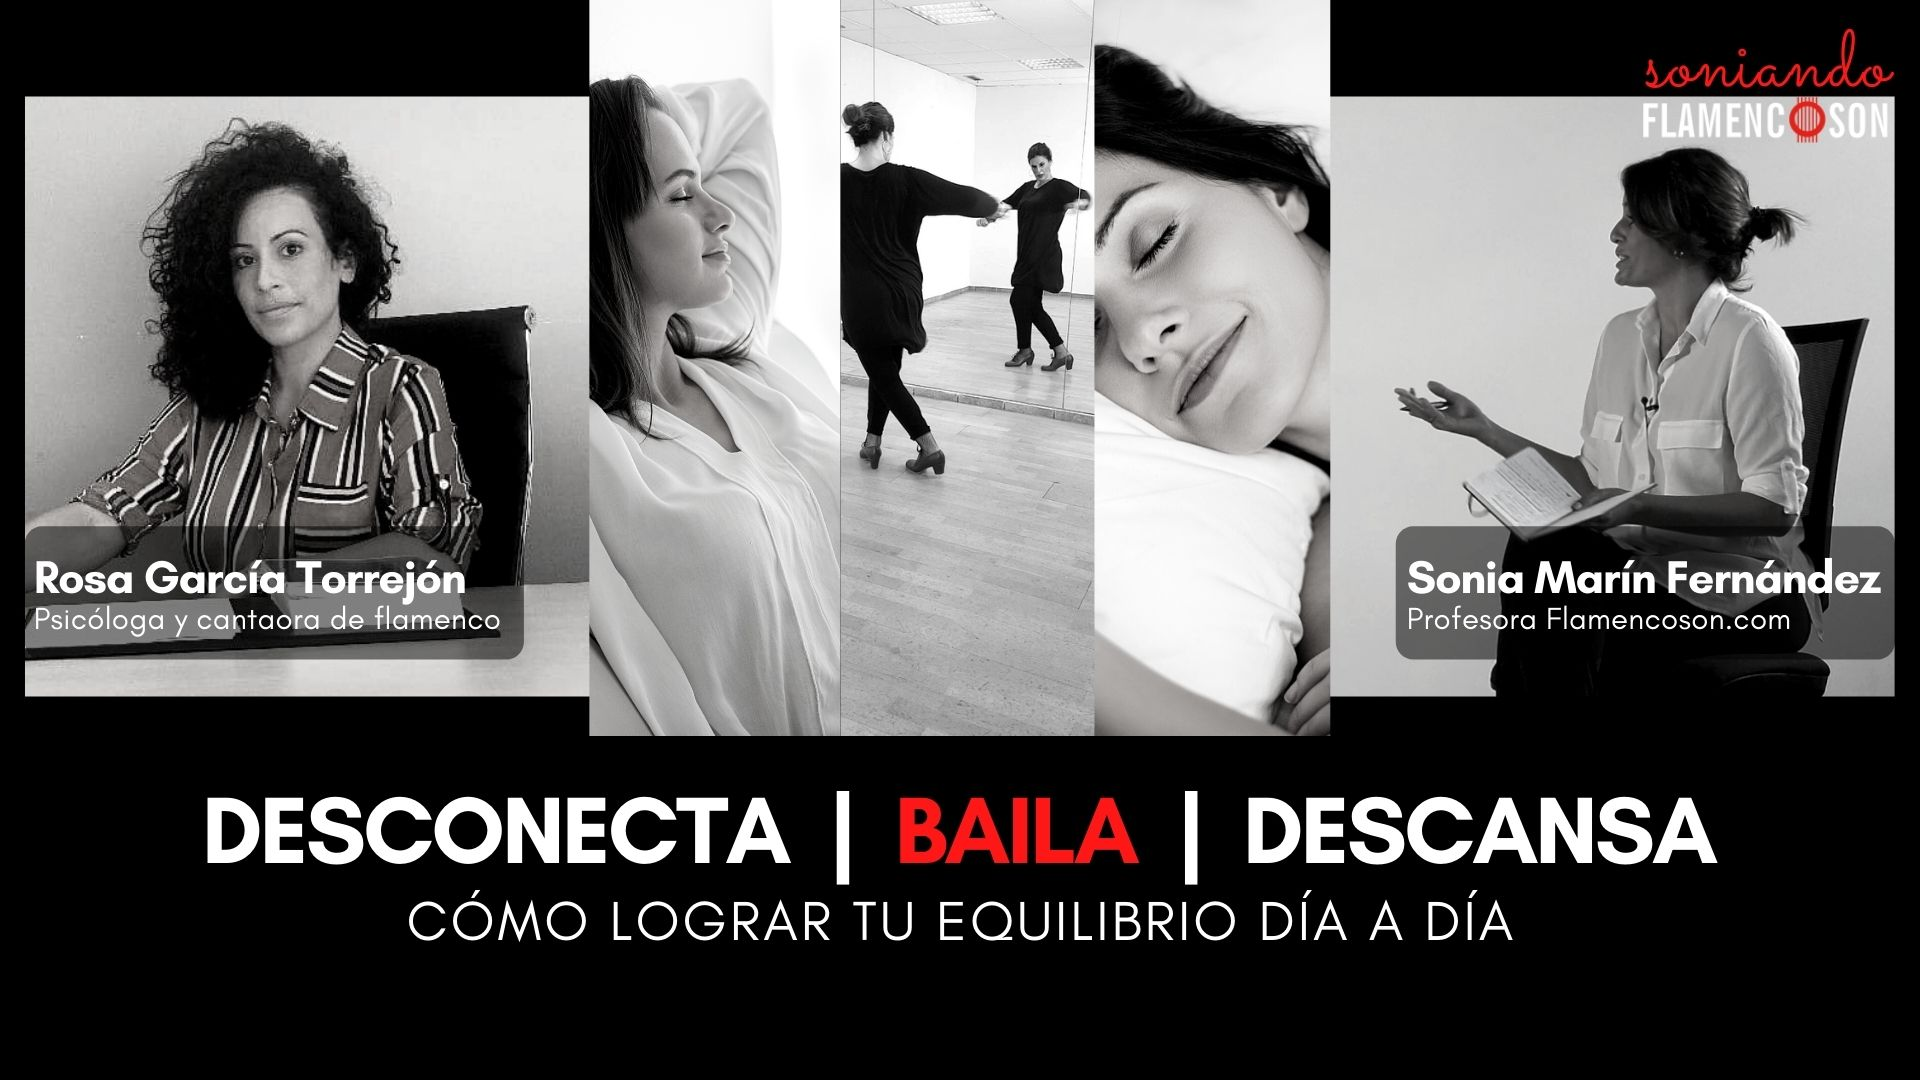 clases de flamenco online